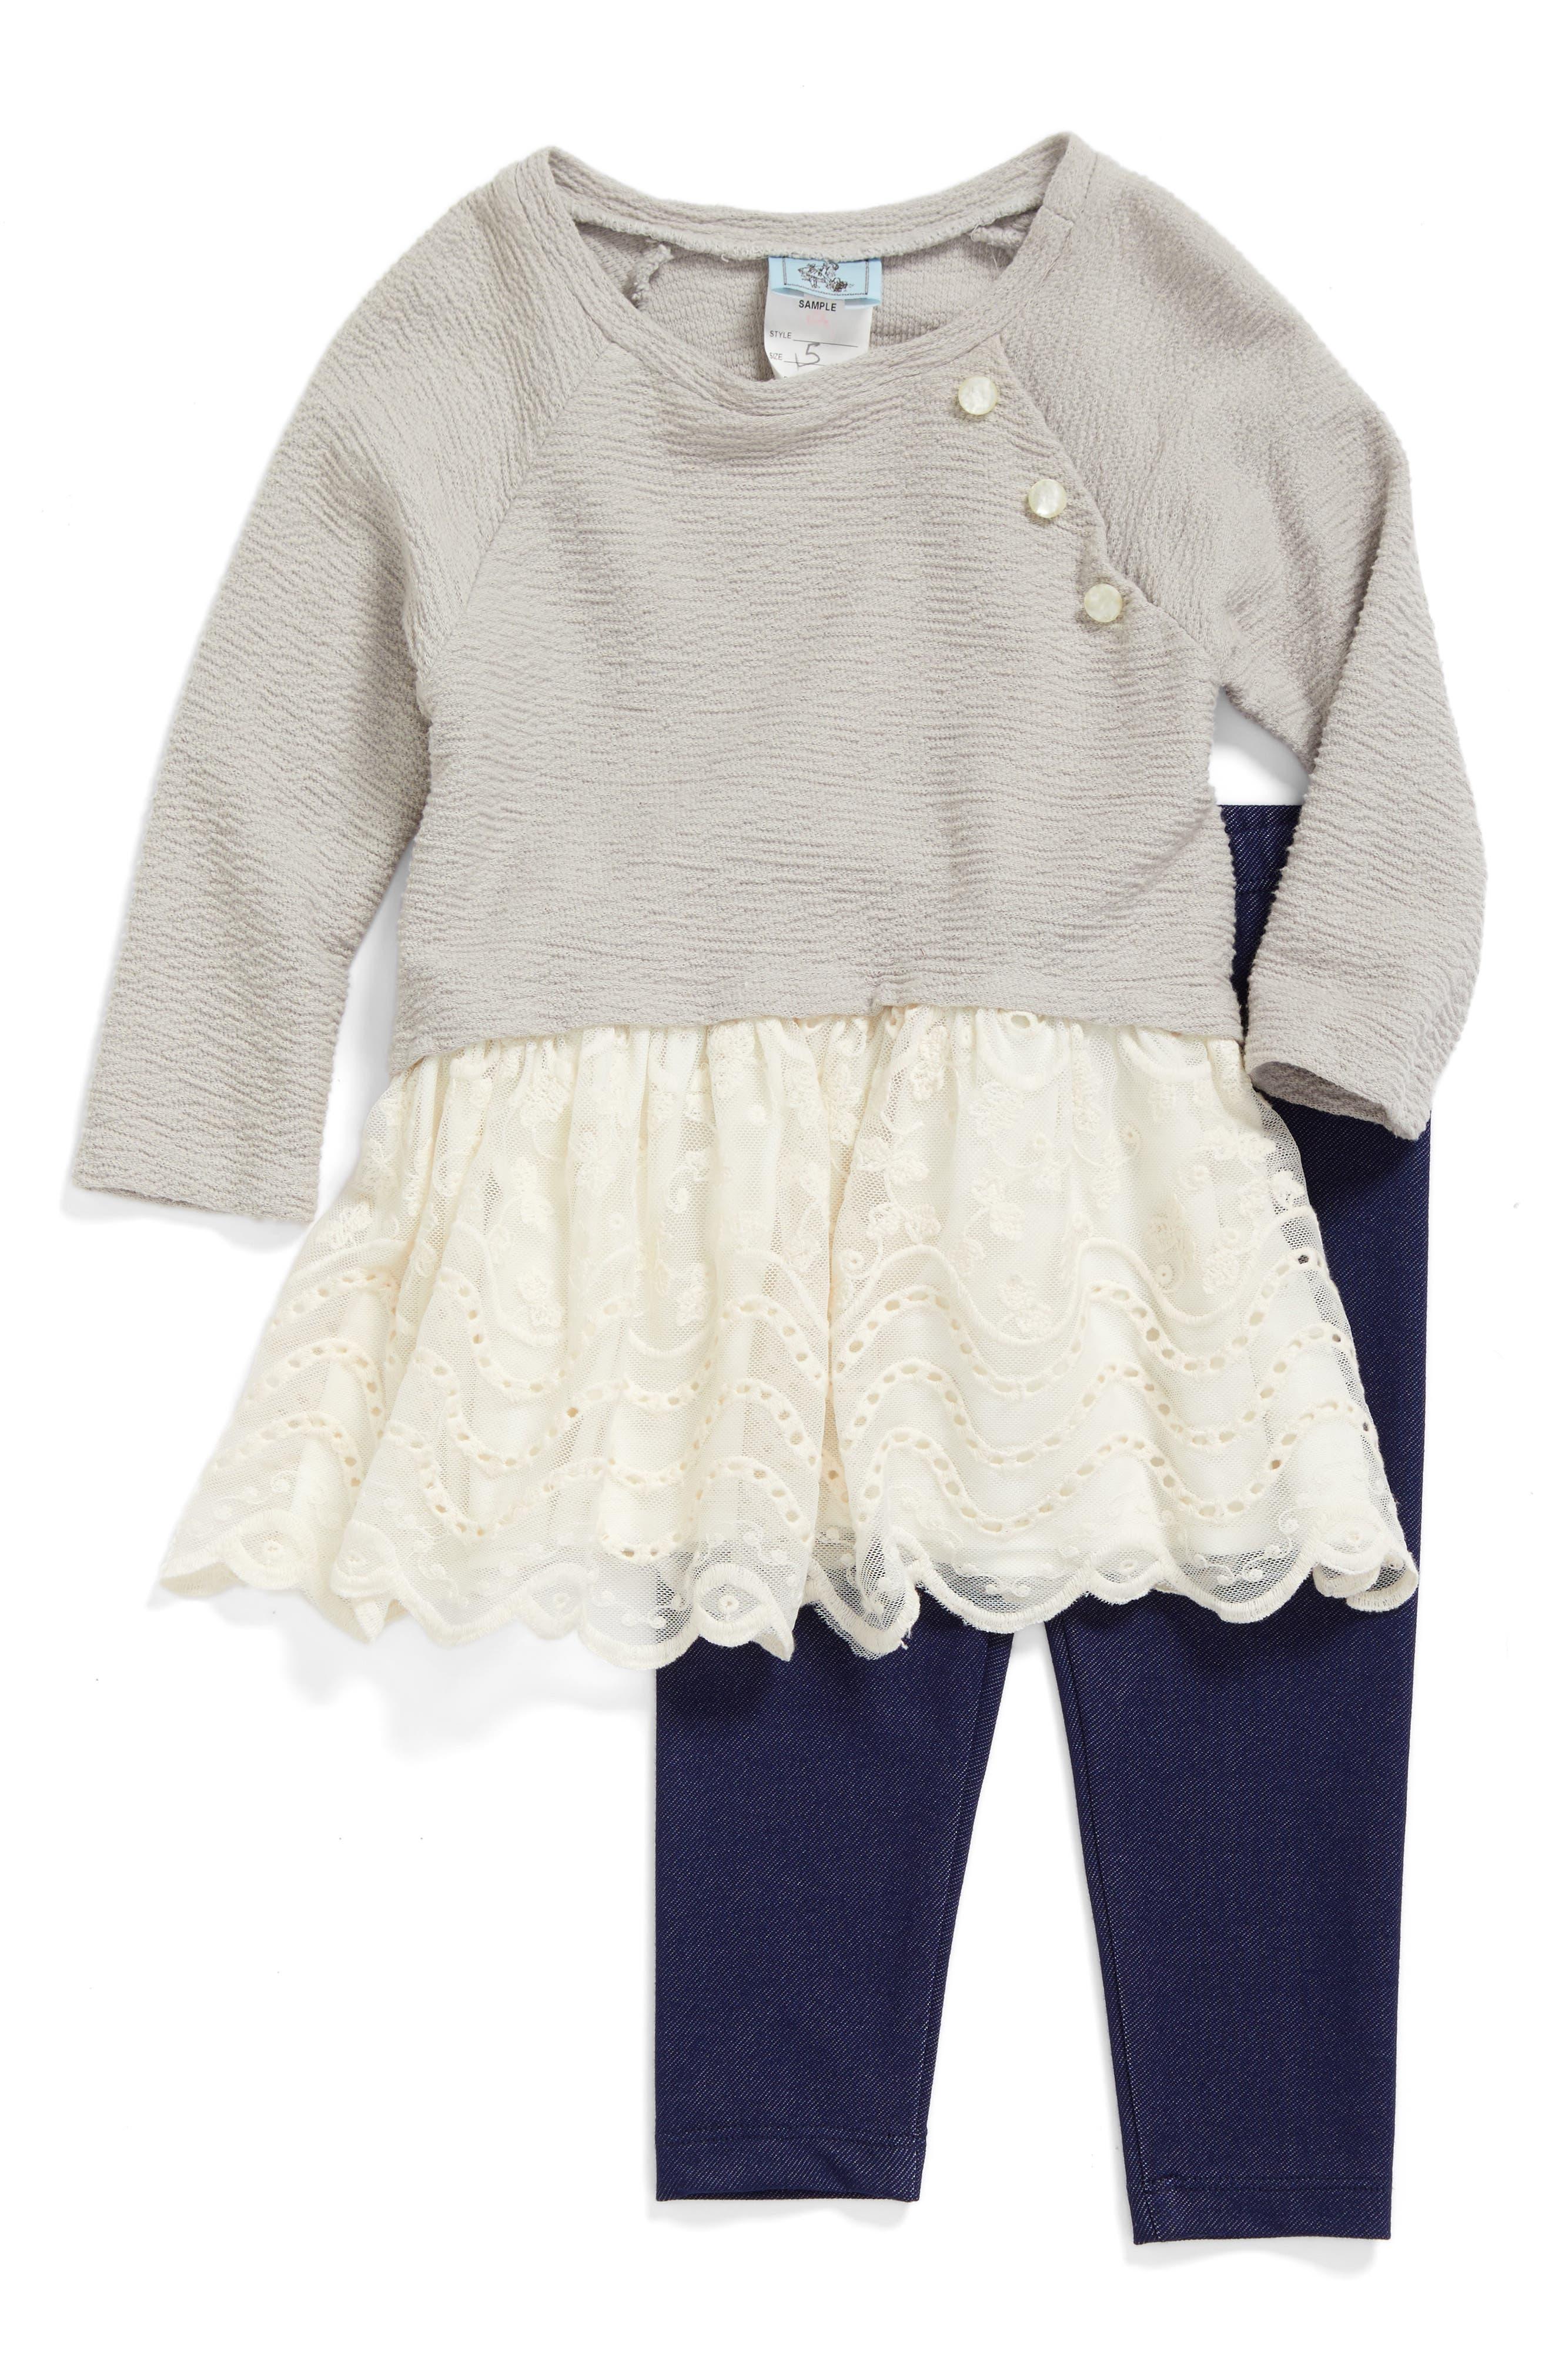 Lace Peplum Top & Leggings Set,                             Main thumbnail 1, color,                             Light Grey